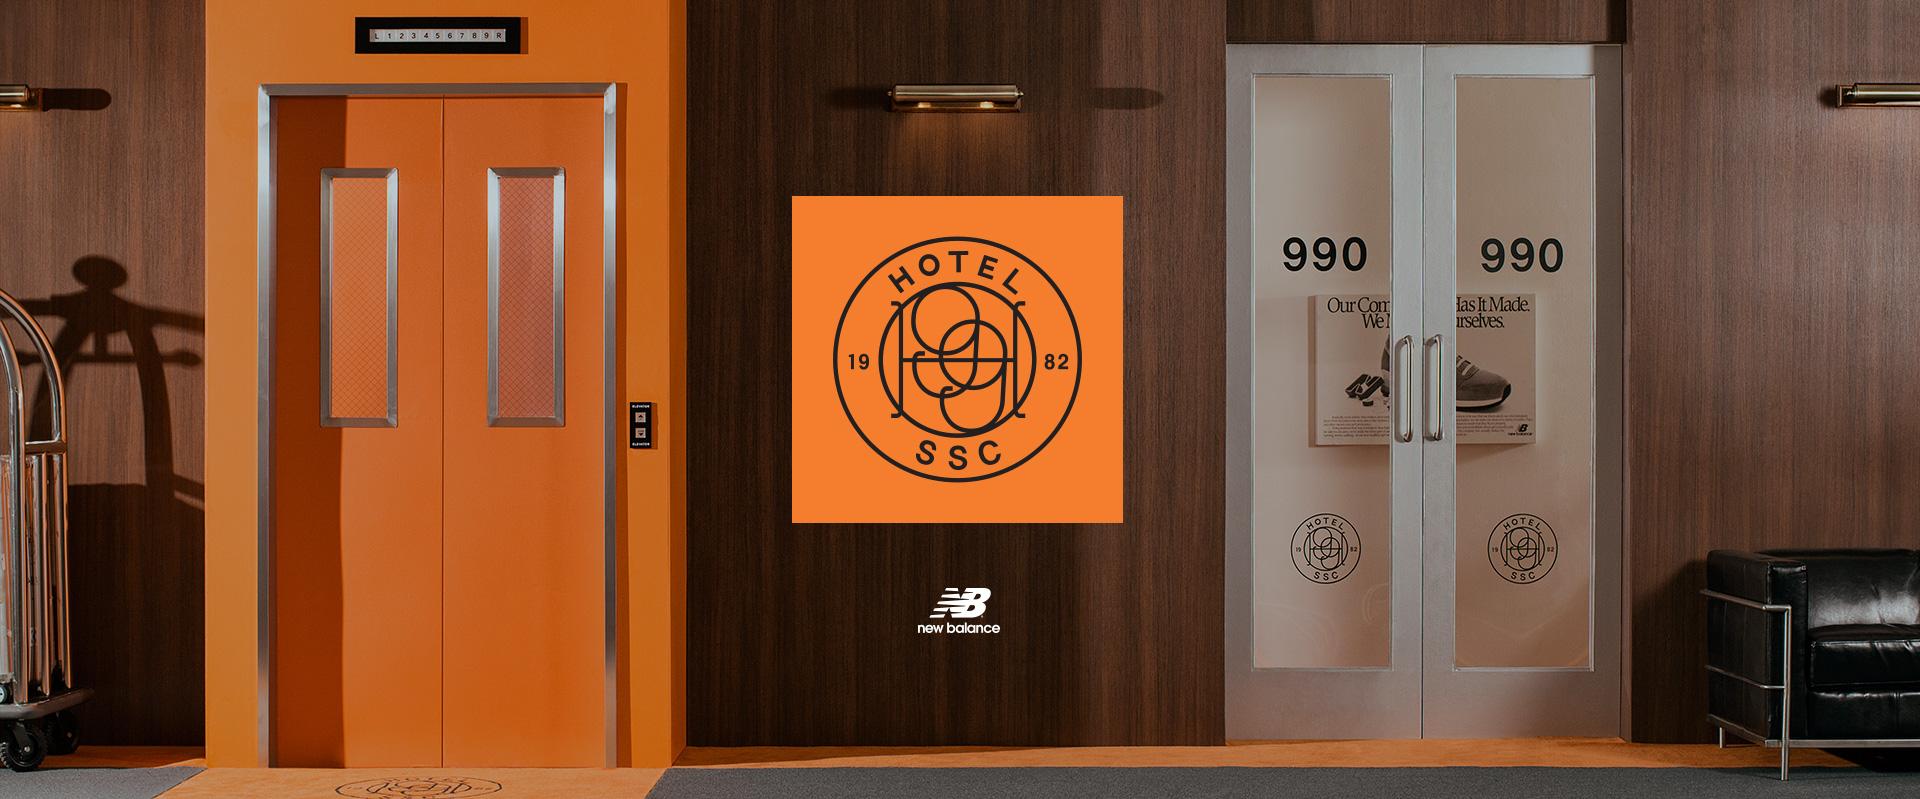 hotel990